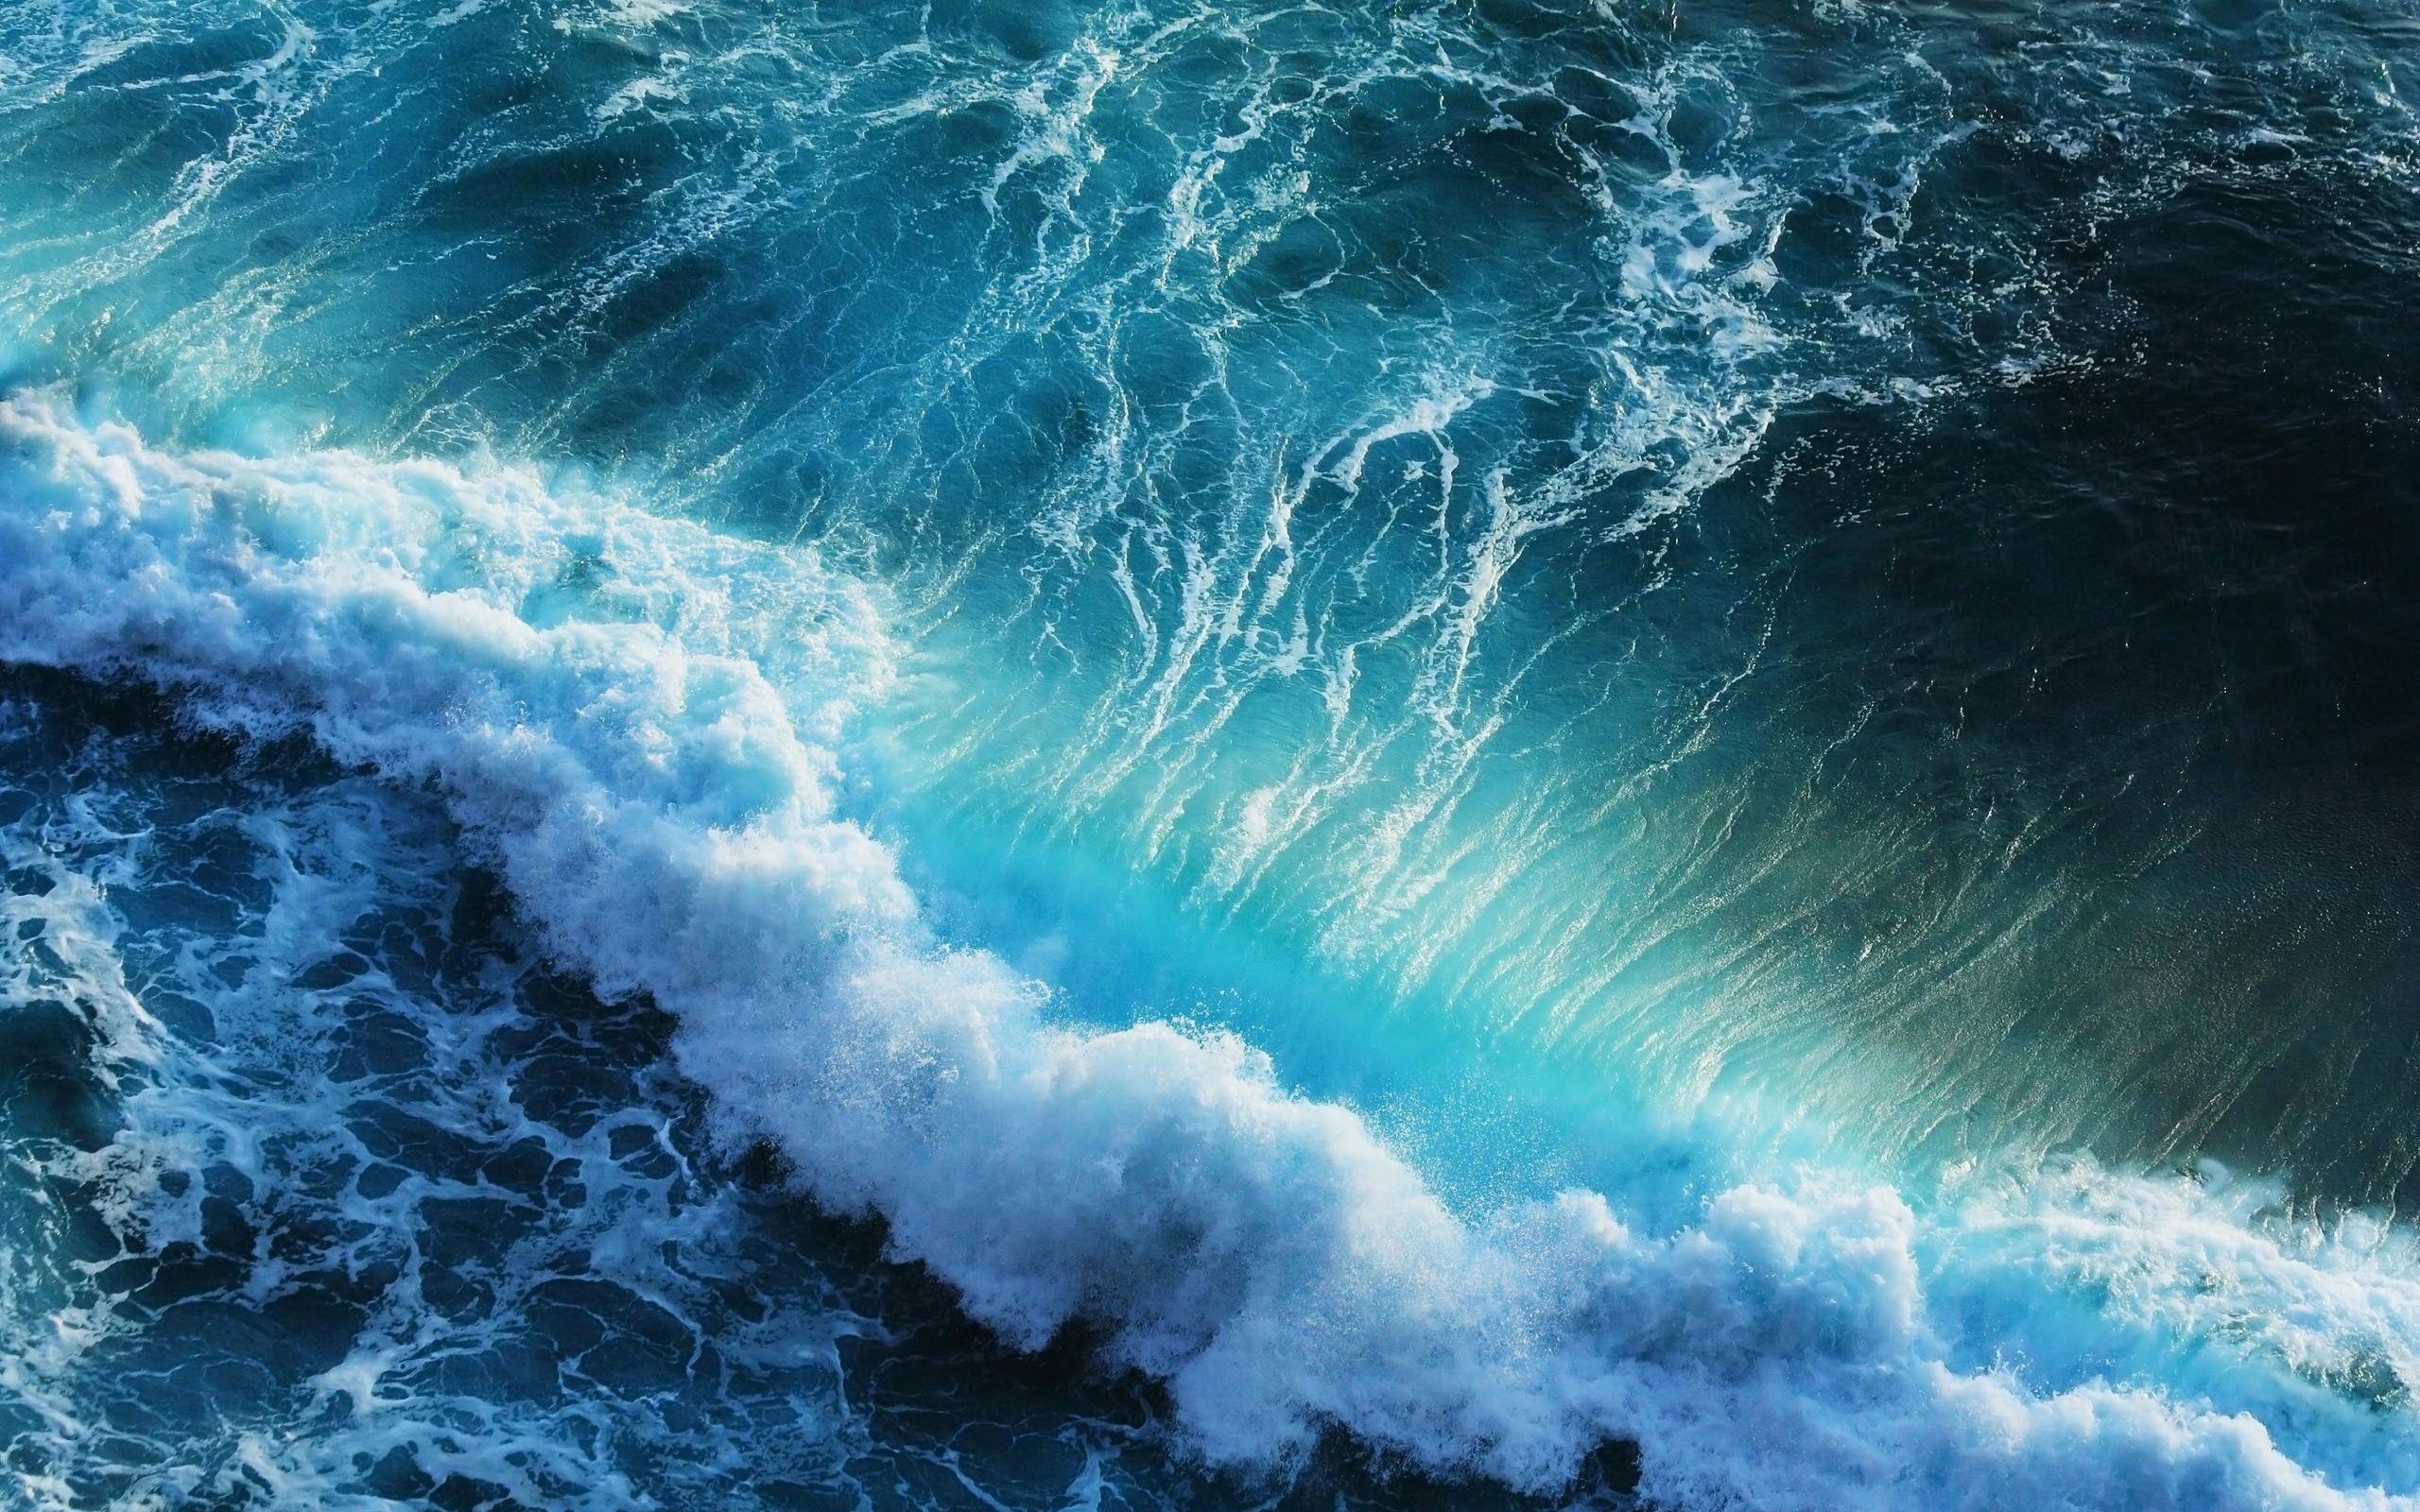 Mobile Ocean Wallpapers HD.